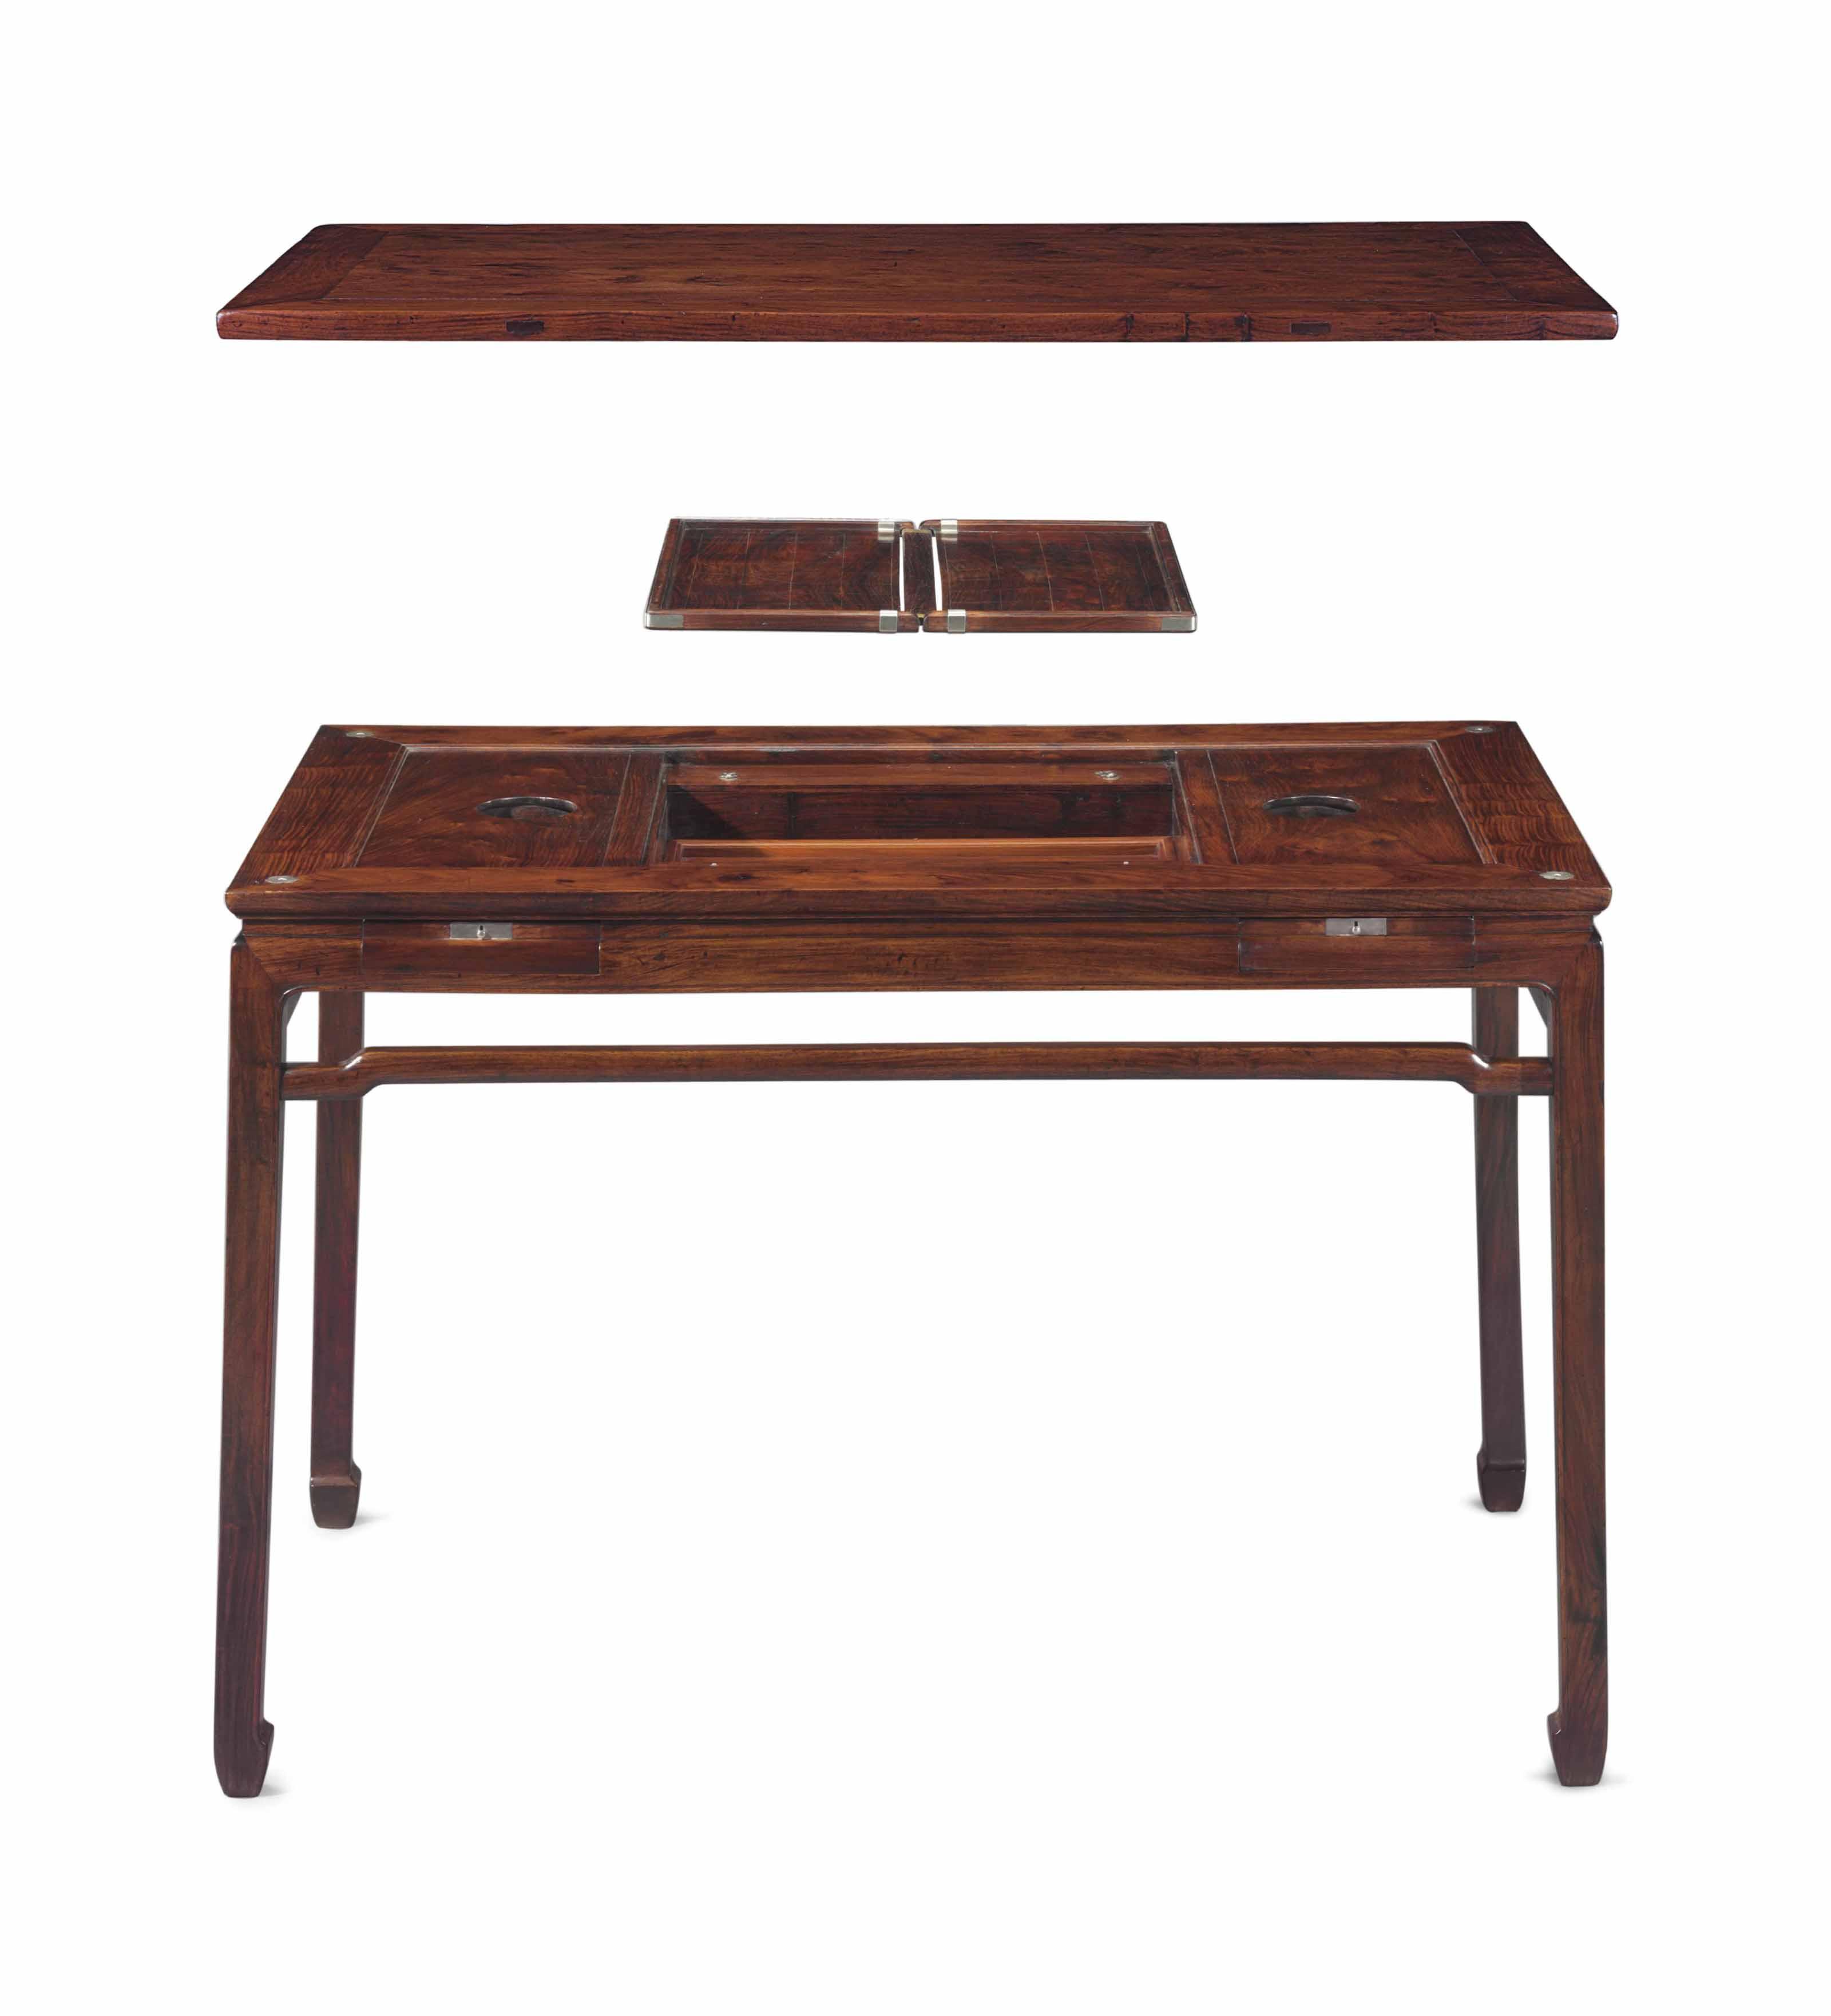 A VERY RARE HUANGHUALI WAISTED RECTANGULAR CORNER-LEG GAMES TABLE